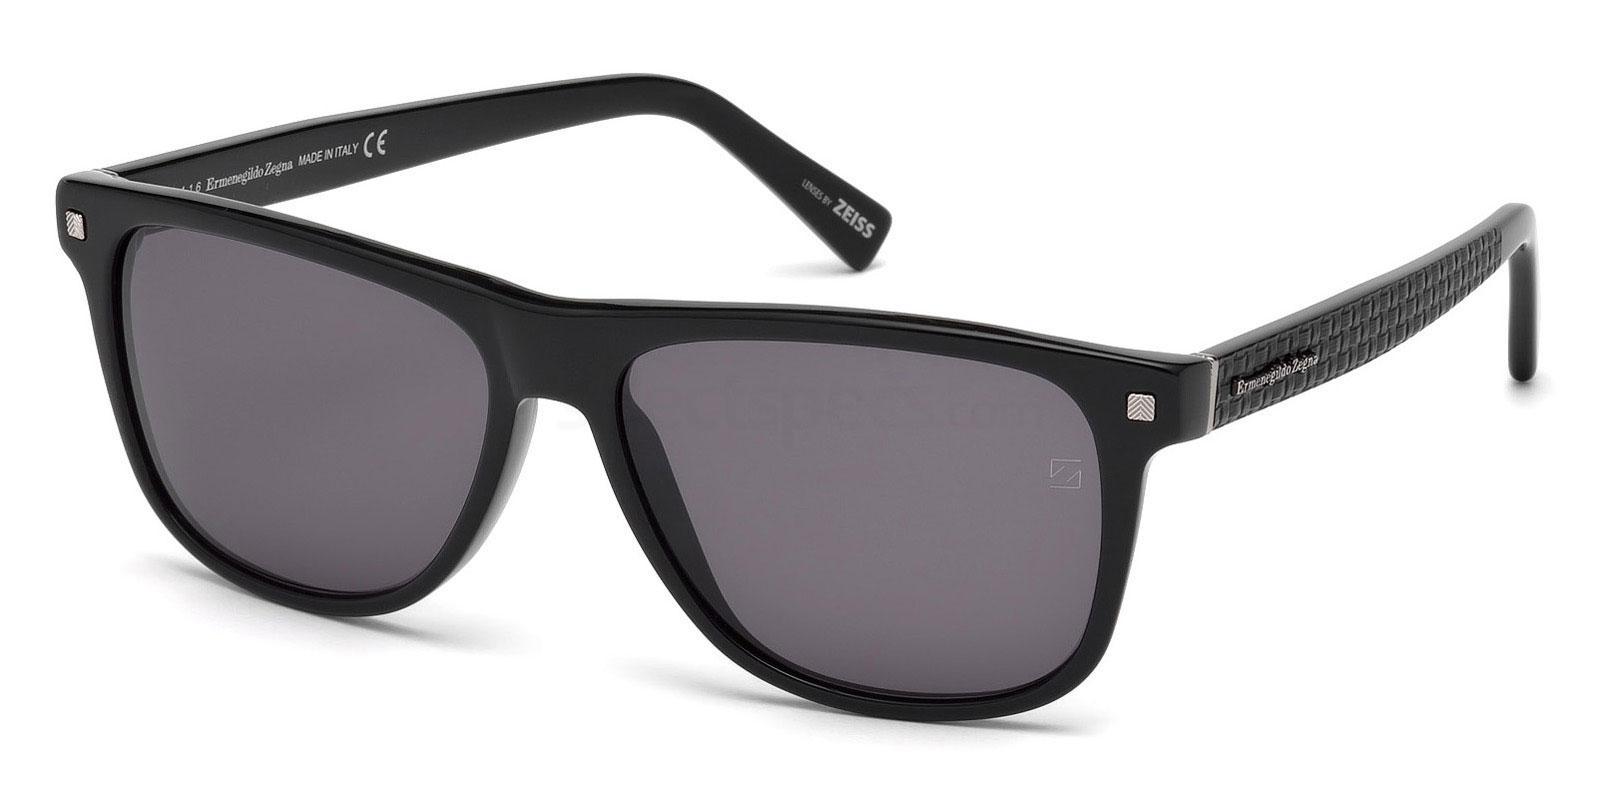 01A EZ0074 Sunglasses, Ermenegildo Zegna